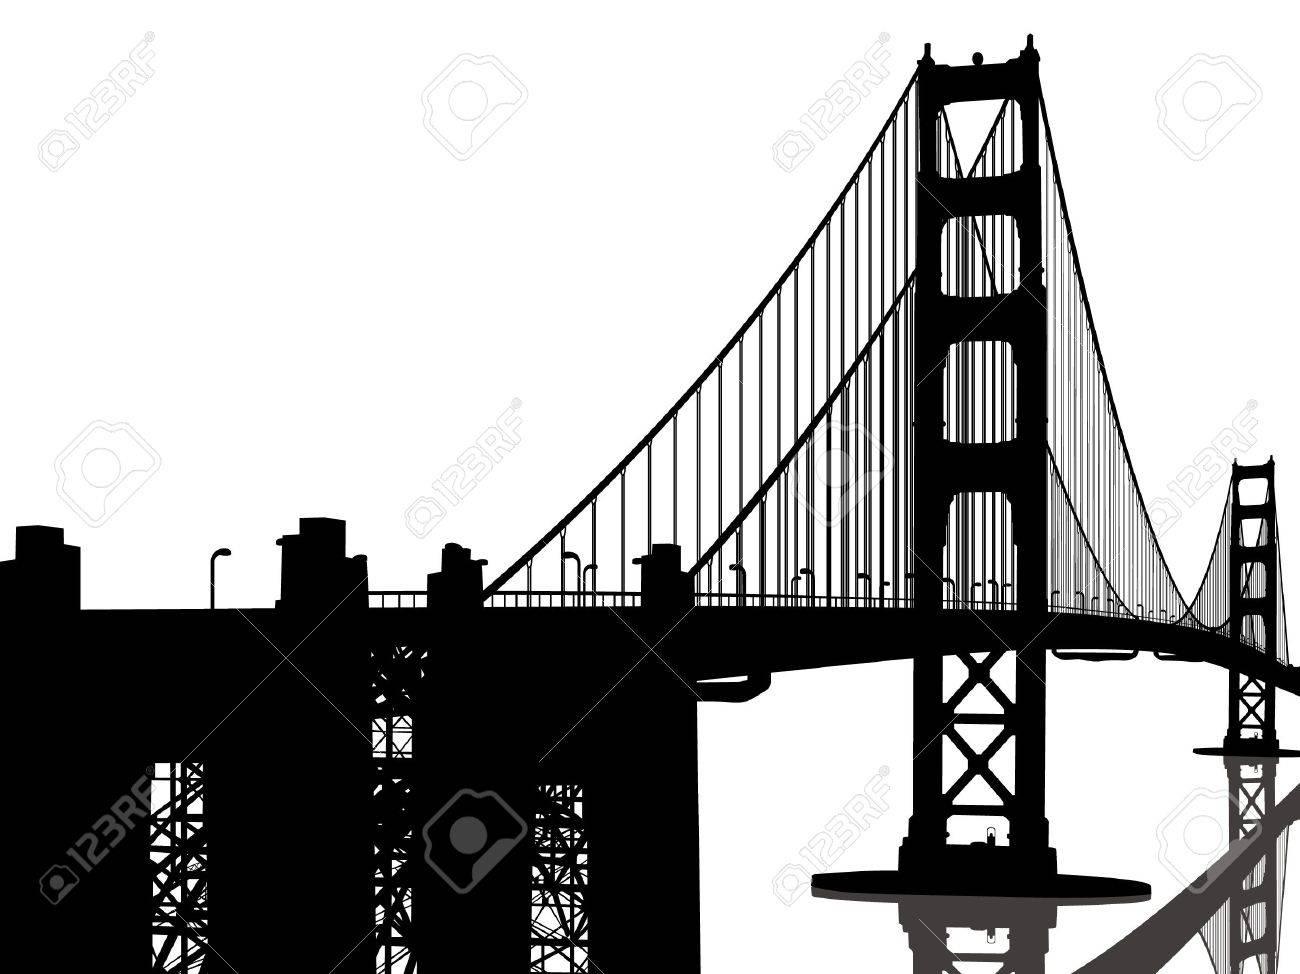 Golden Gate Bridge Stock Vector - 12470524